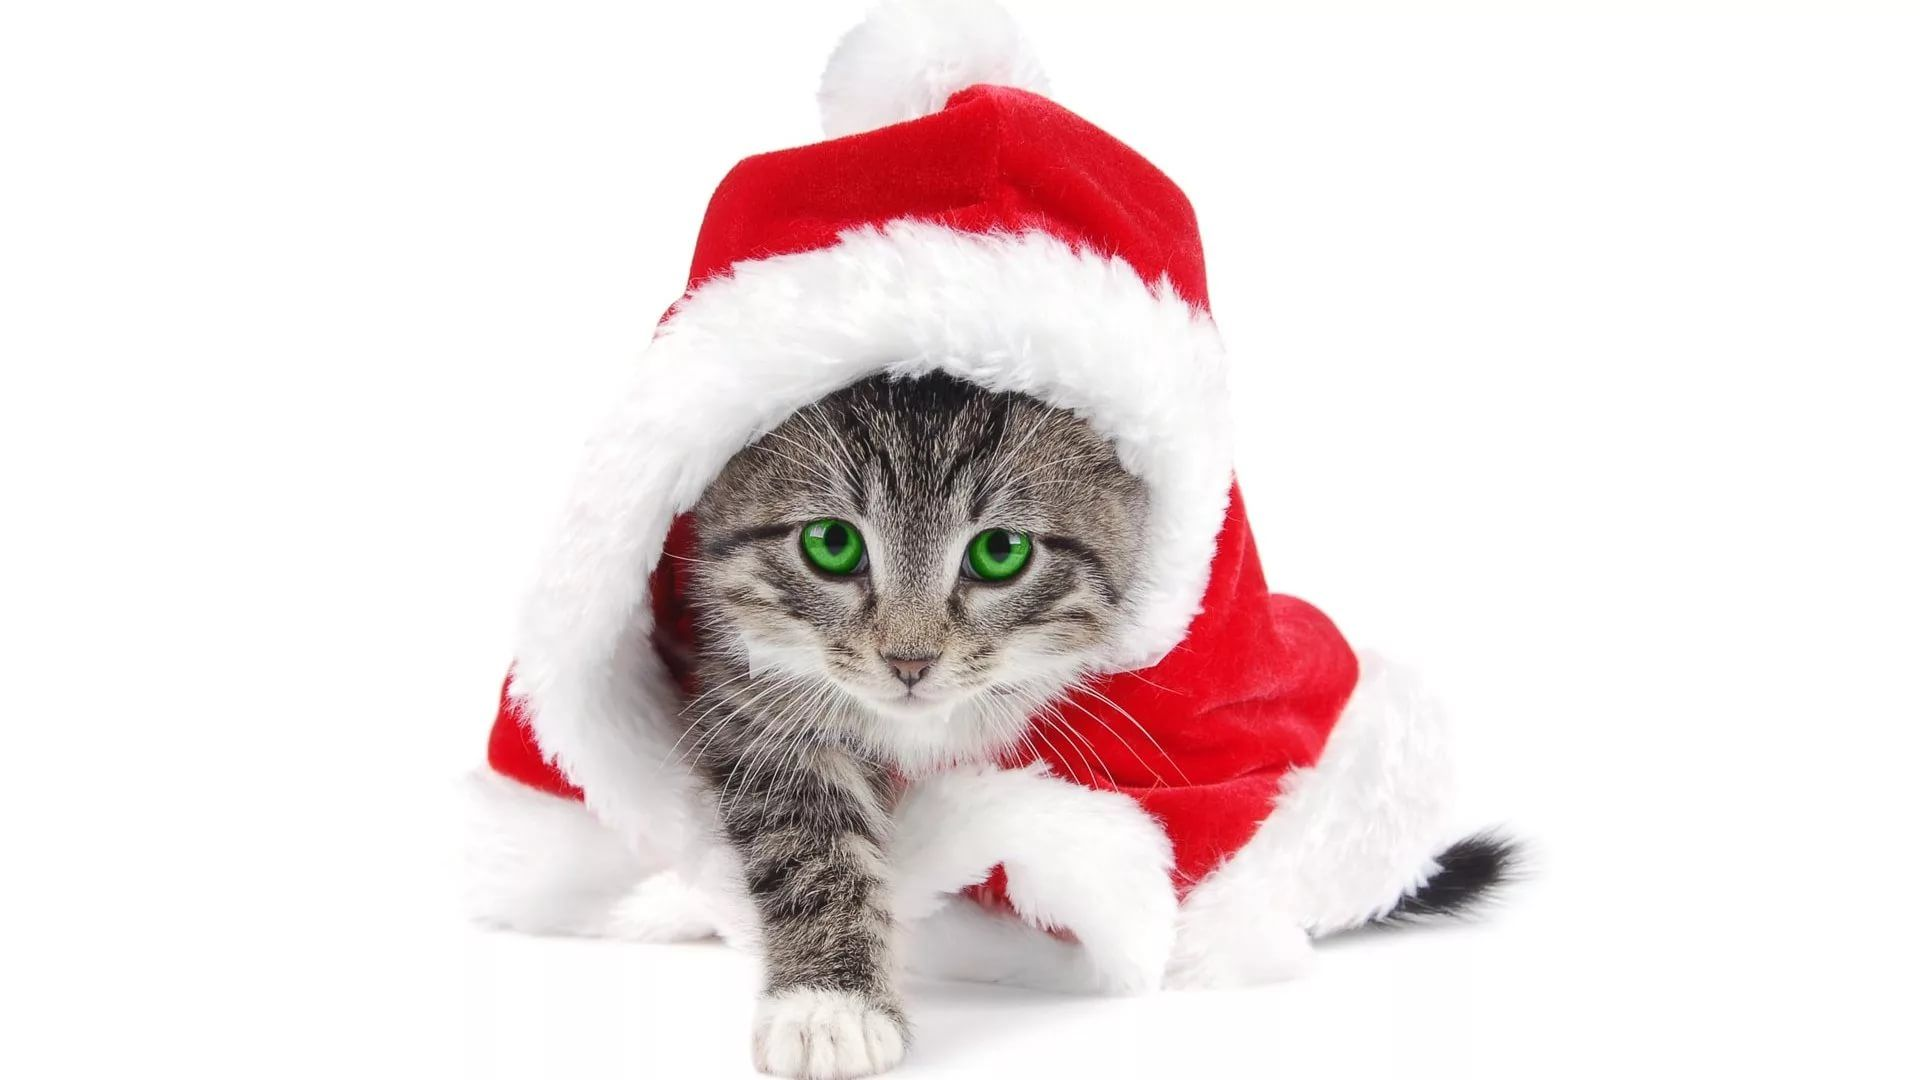 Christmas Cat hd wallpaper download